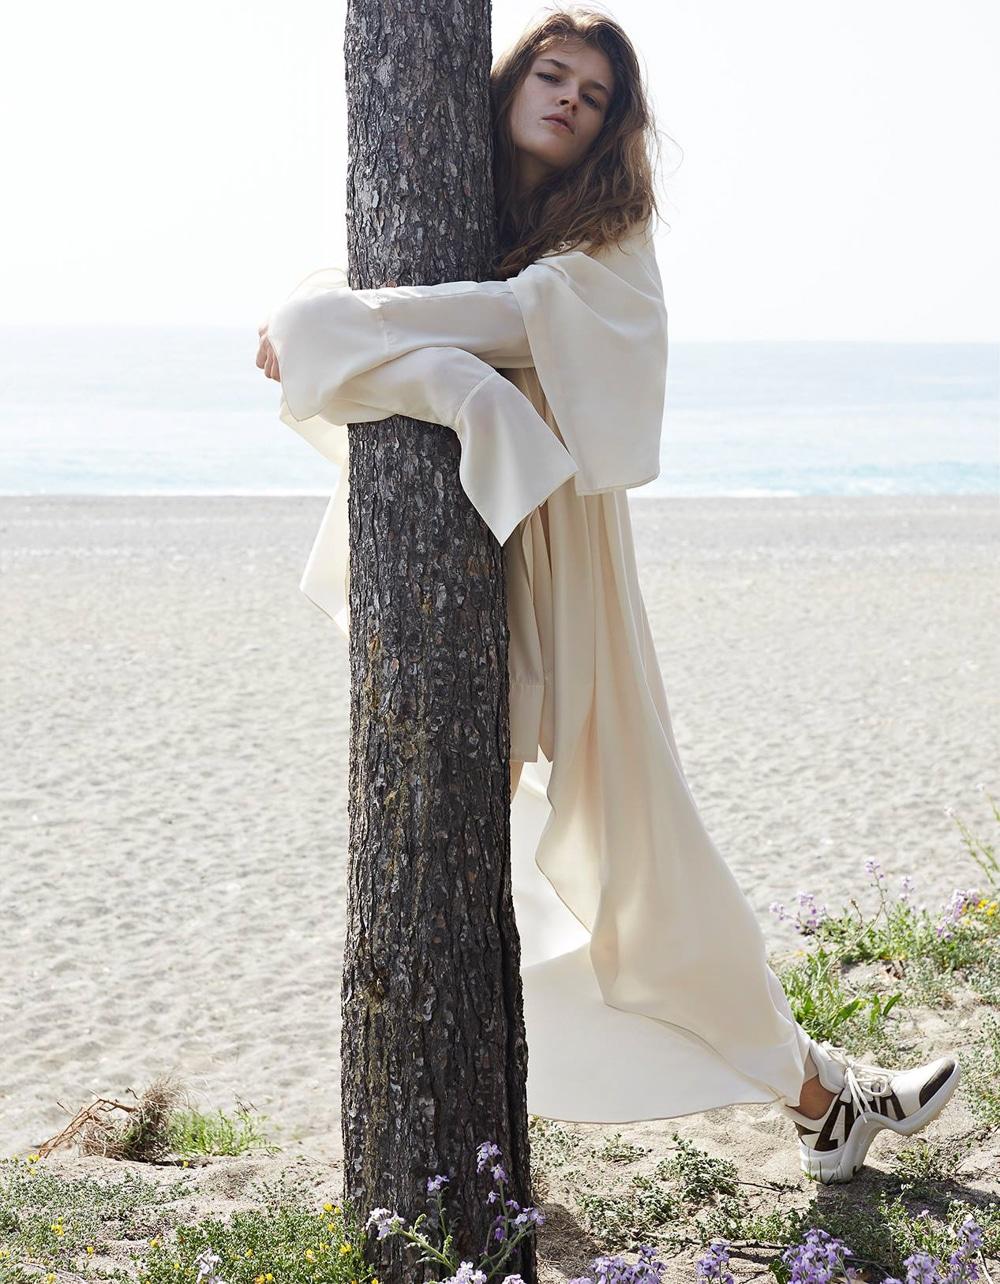 Vogue-Poland-Molly-Smith-Agata-Pospieszynska-4.jpg